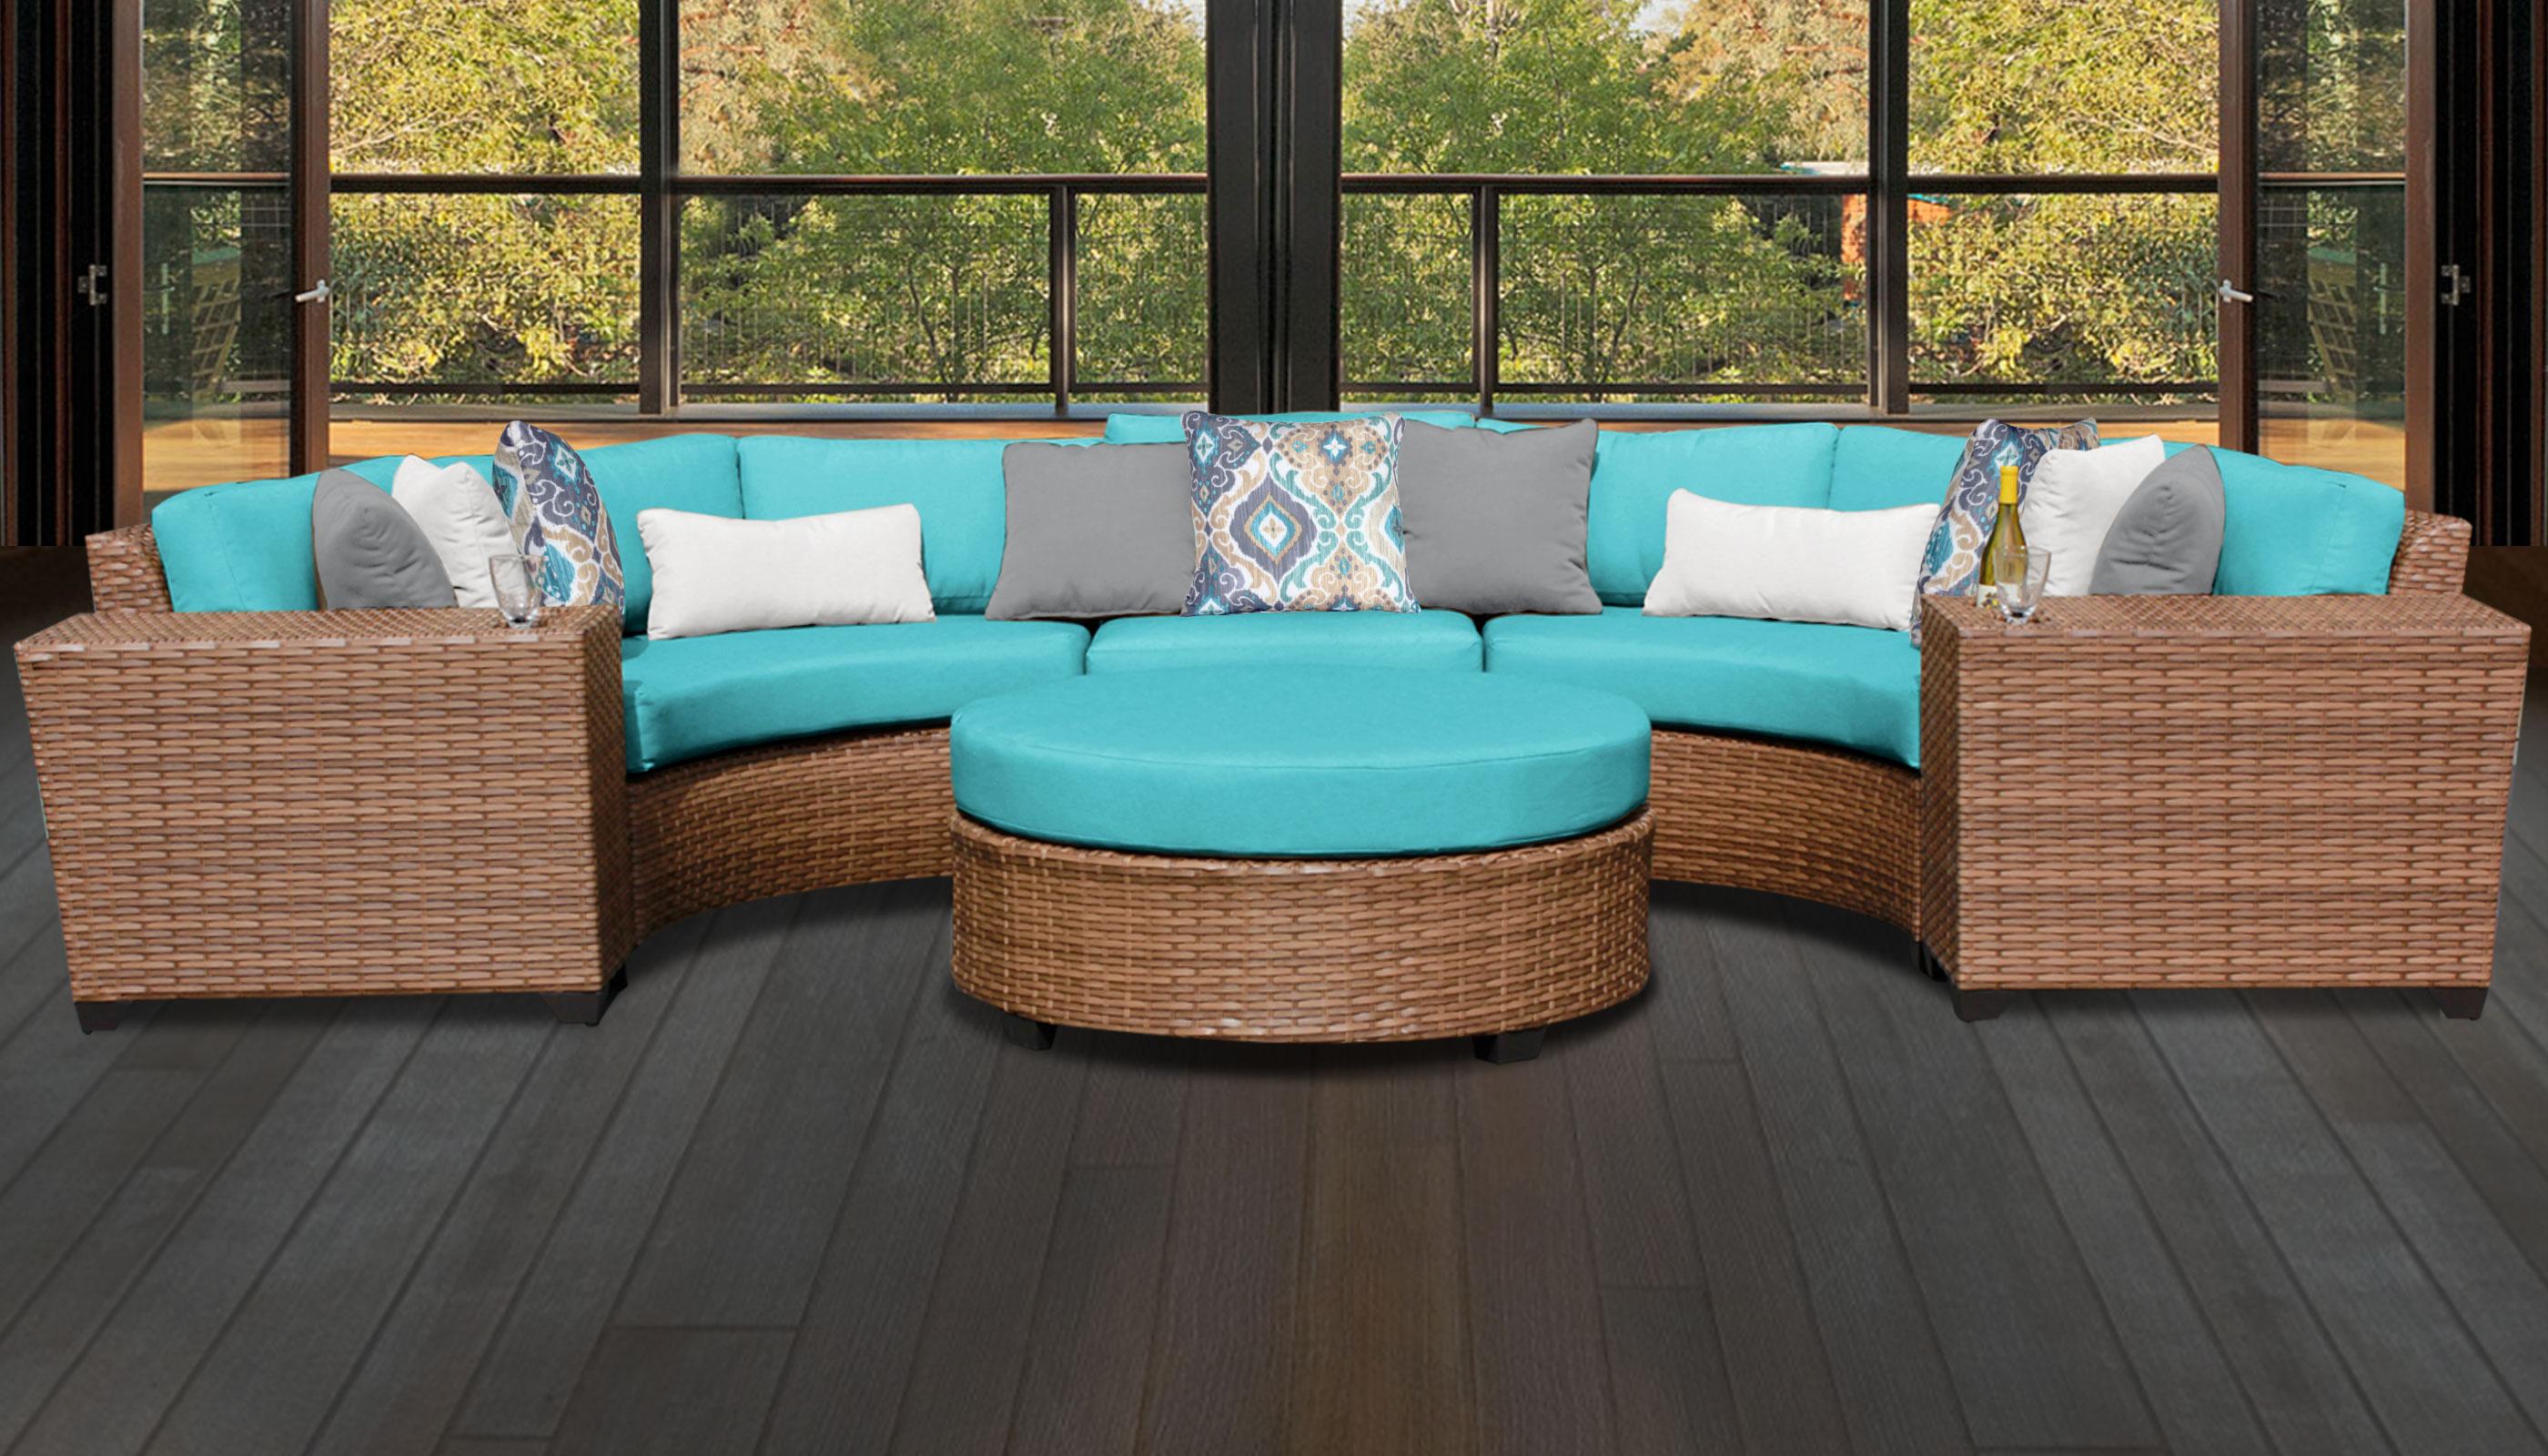 Laguna 6 Piece Outdoor Wicker Patio Furniture Set 06c